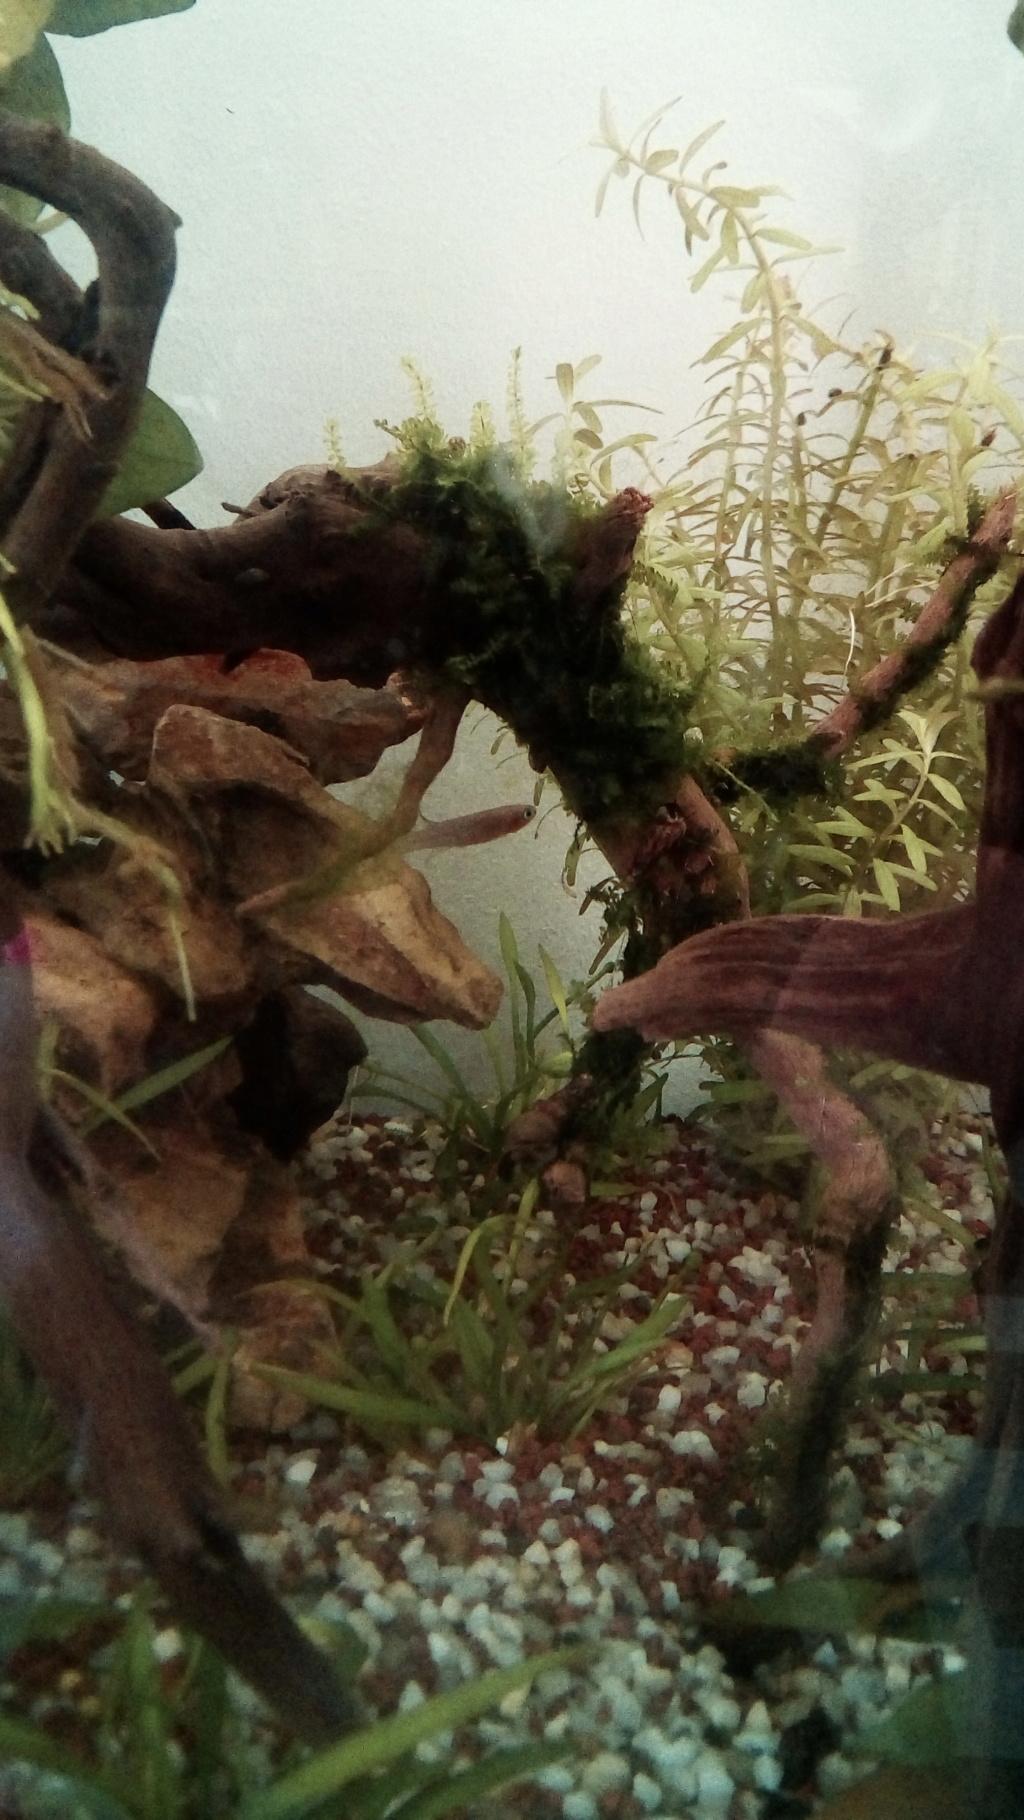 nano aquarium killi cap lopez - Page 3 Img_2282